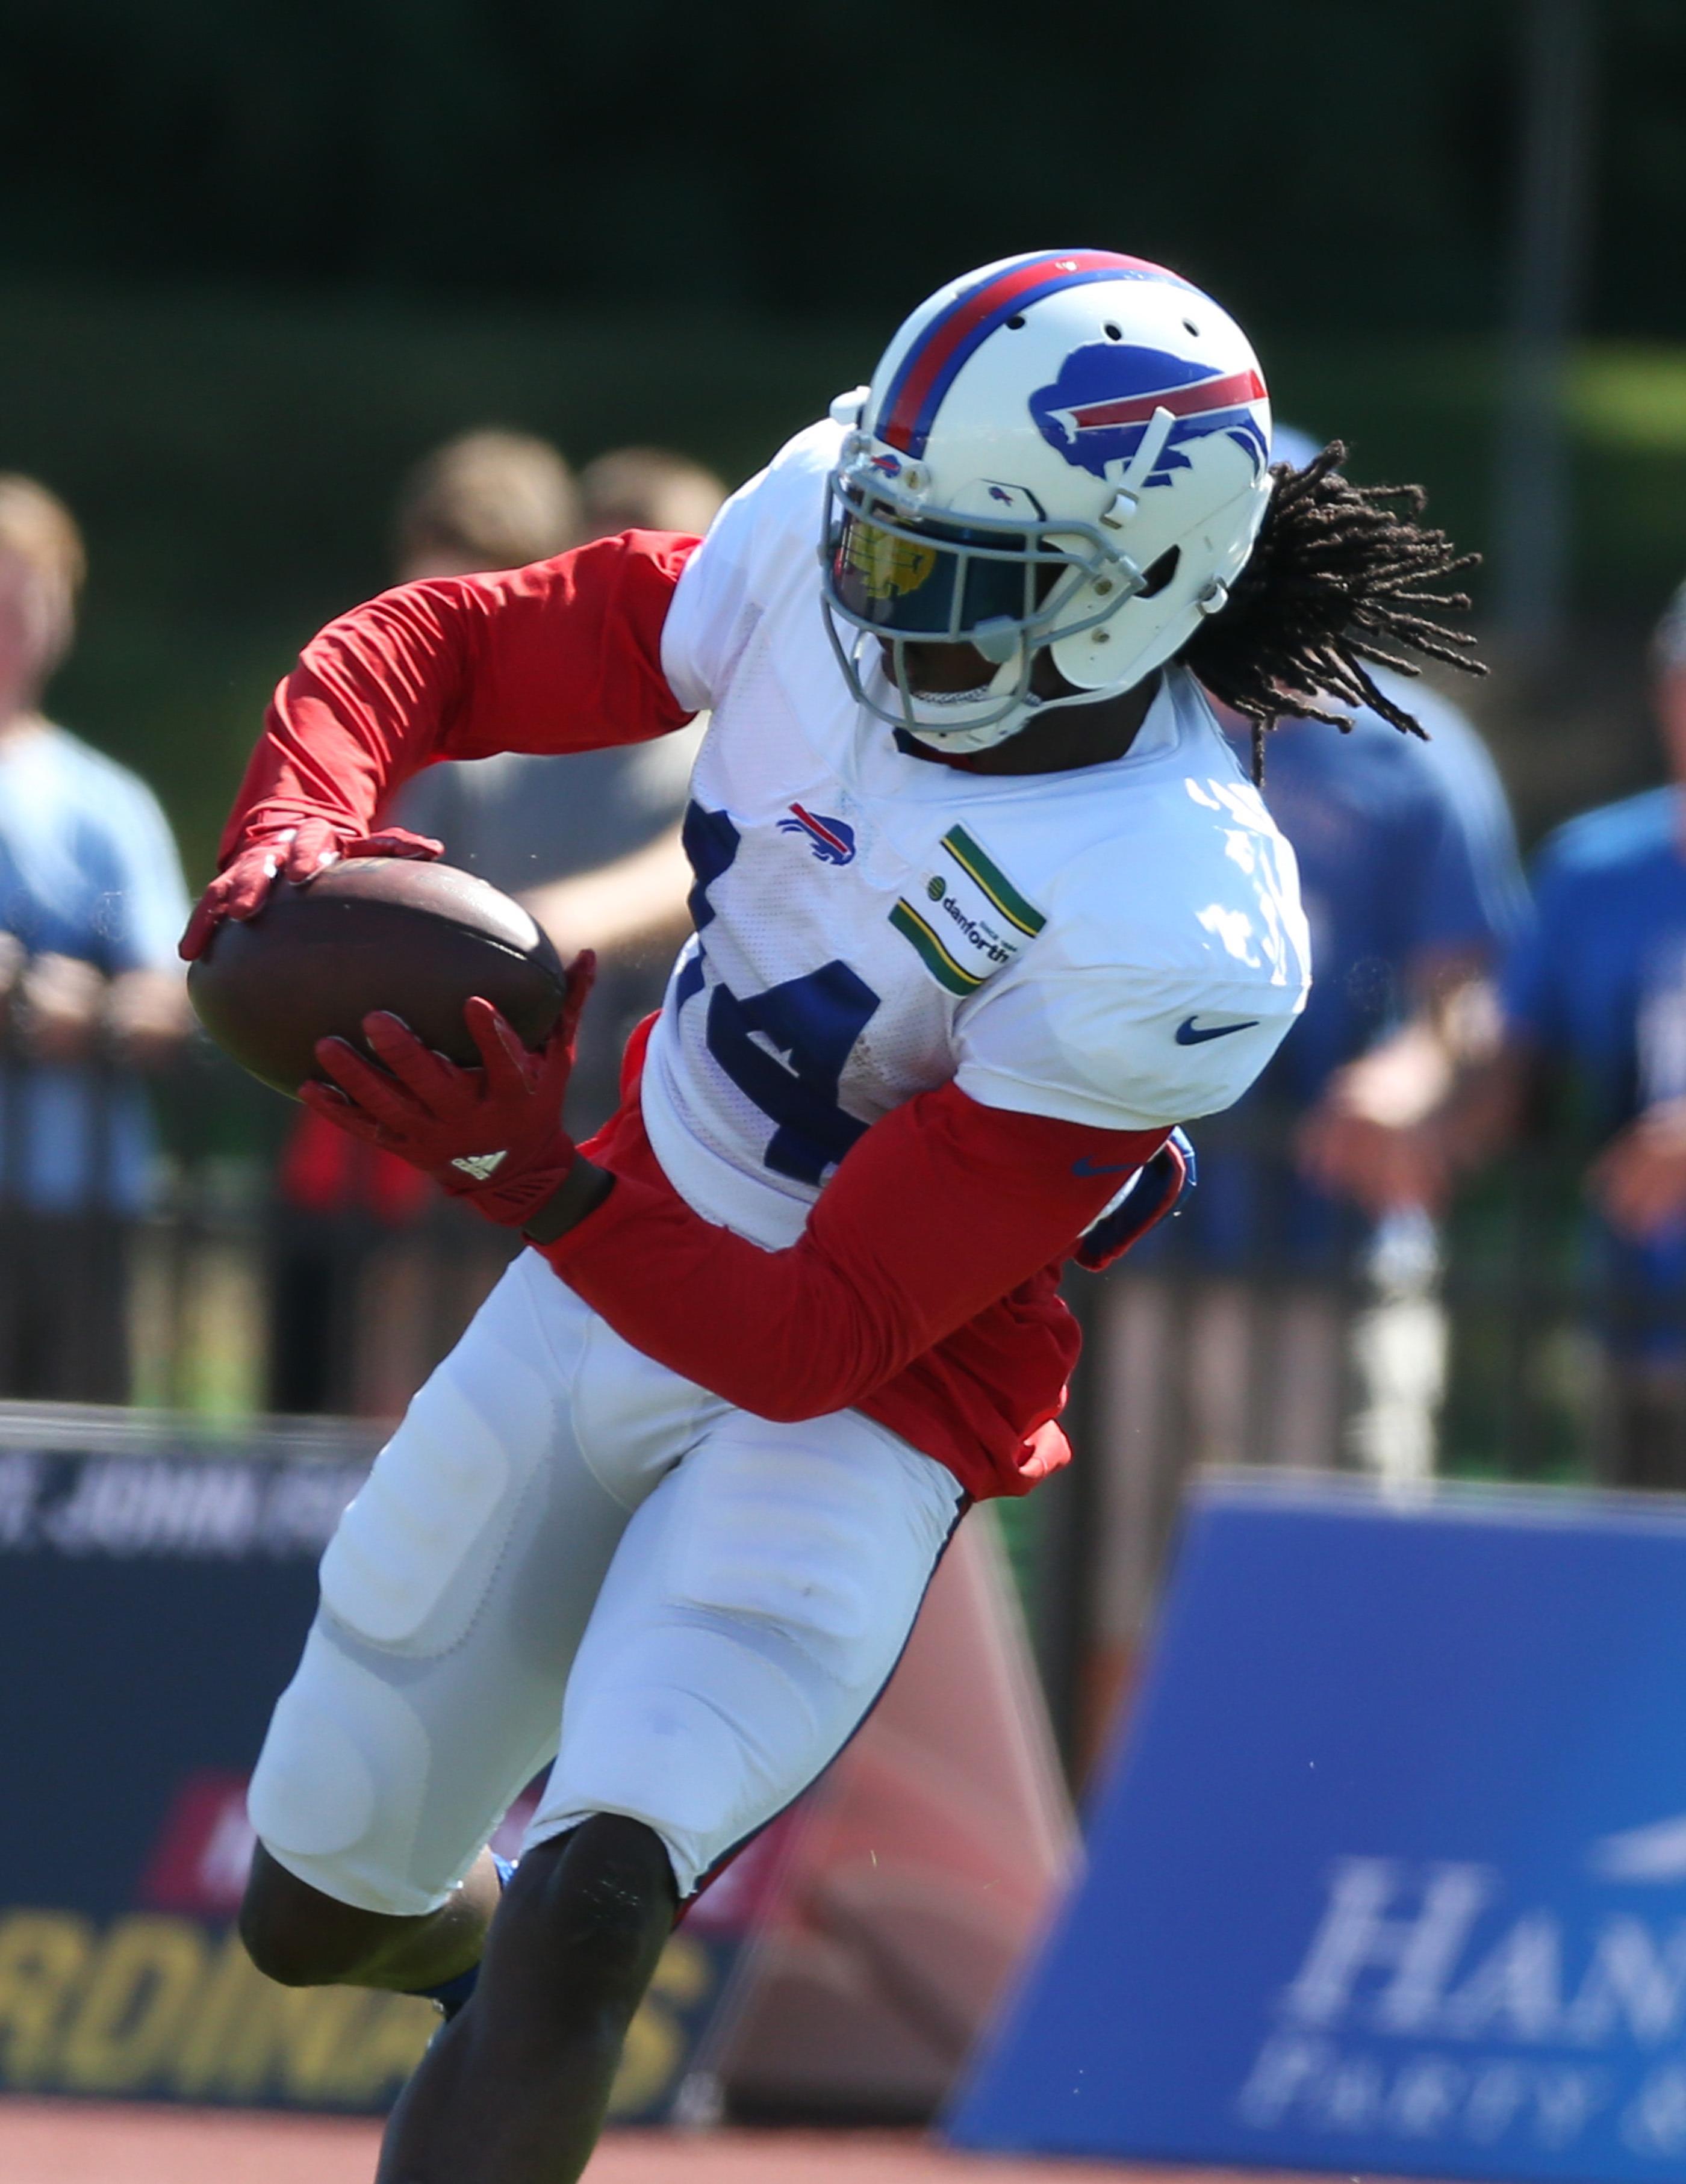 Buffalo Bills wide receiver Sammy Watkins.